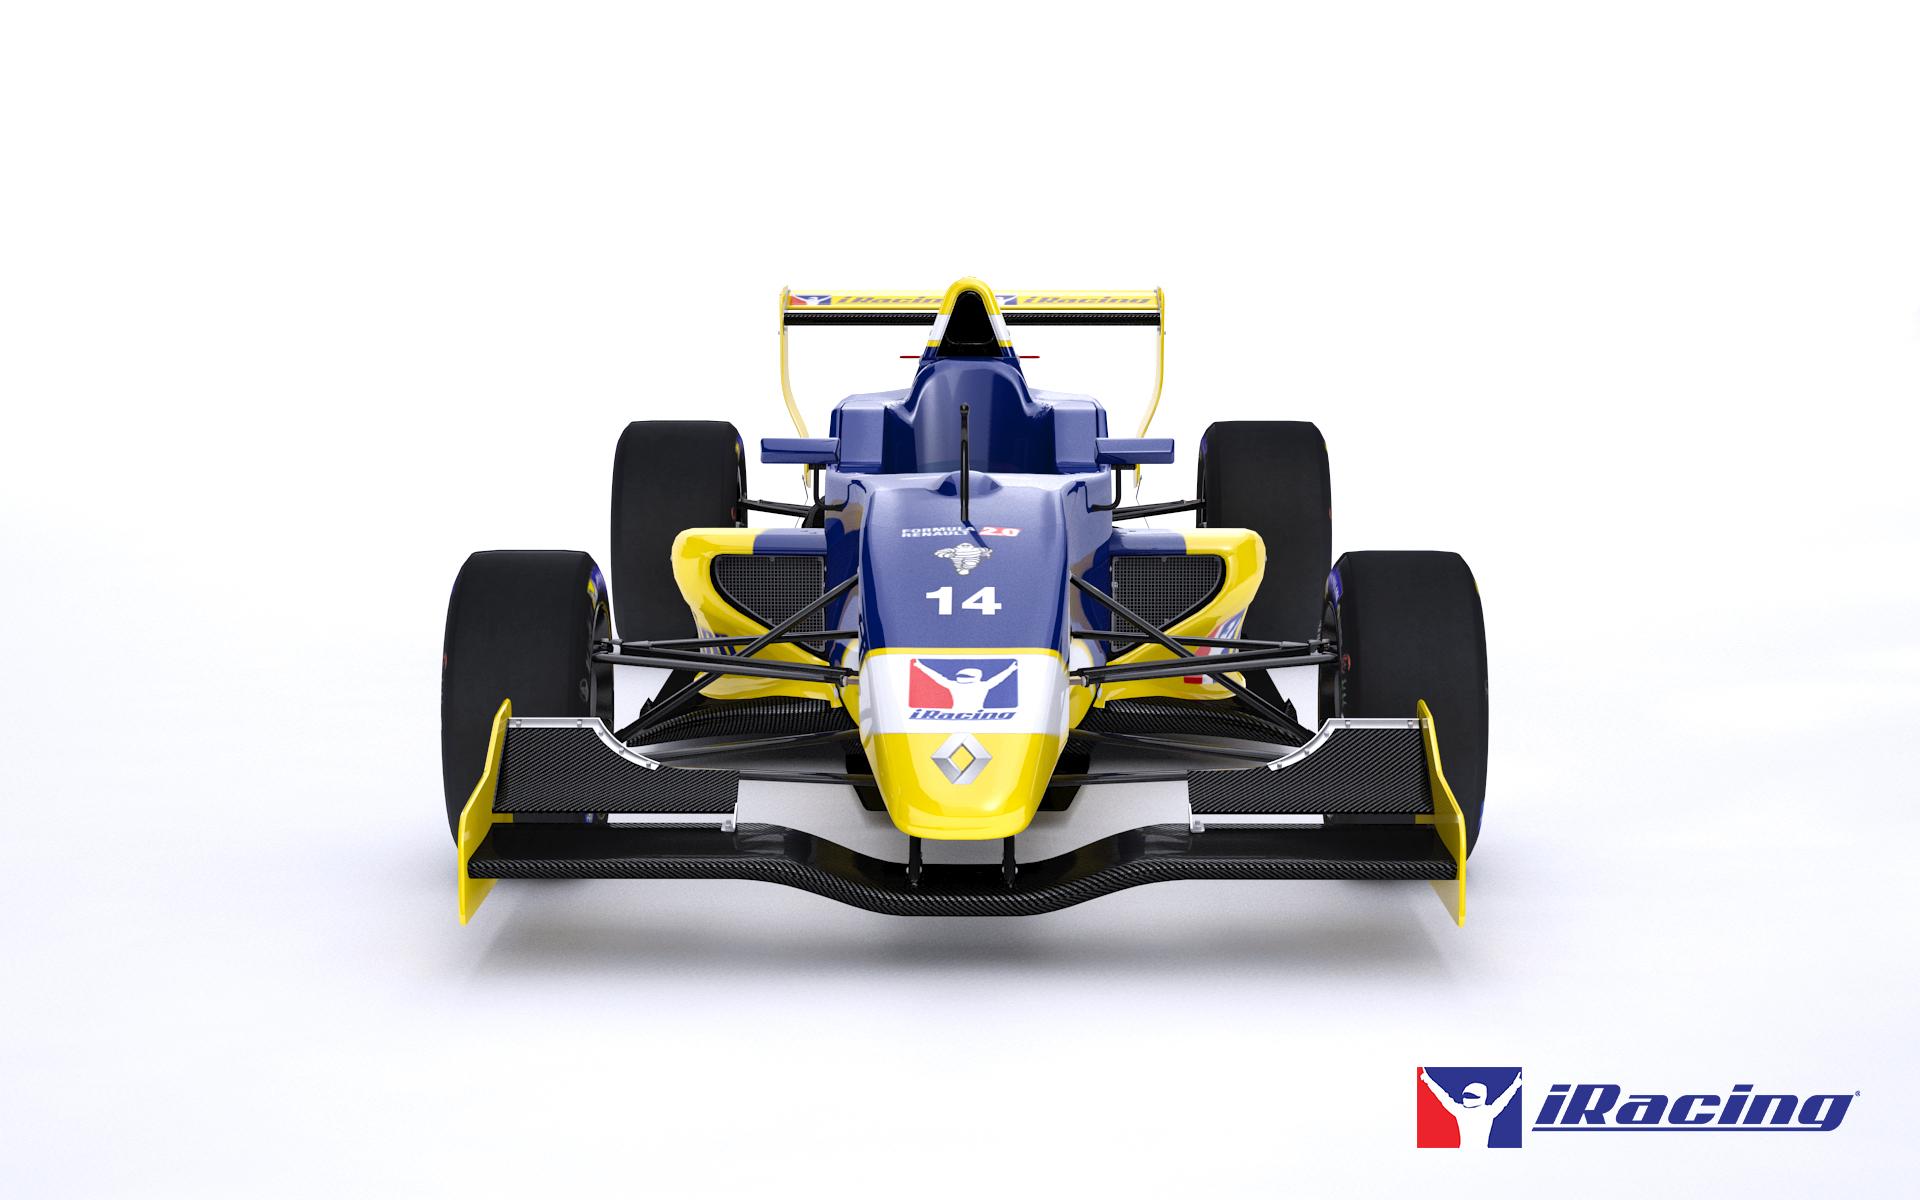 formularenault20_nose